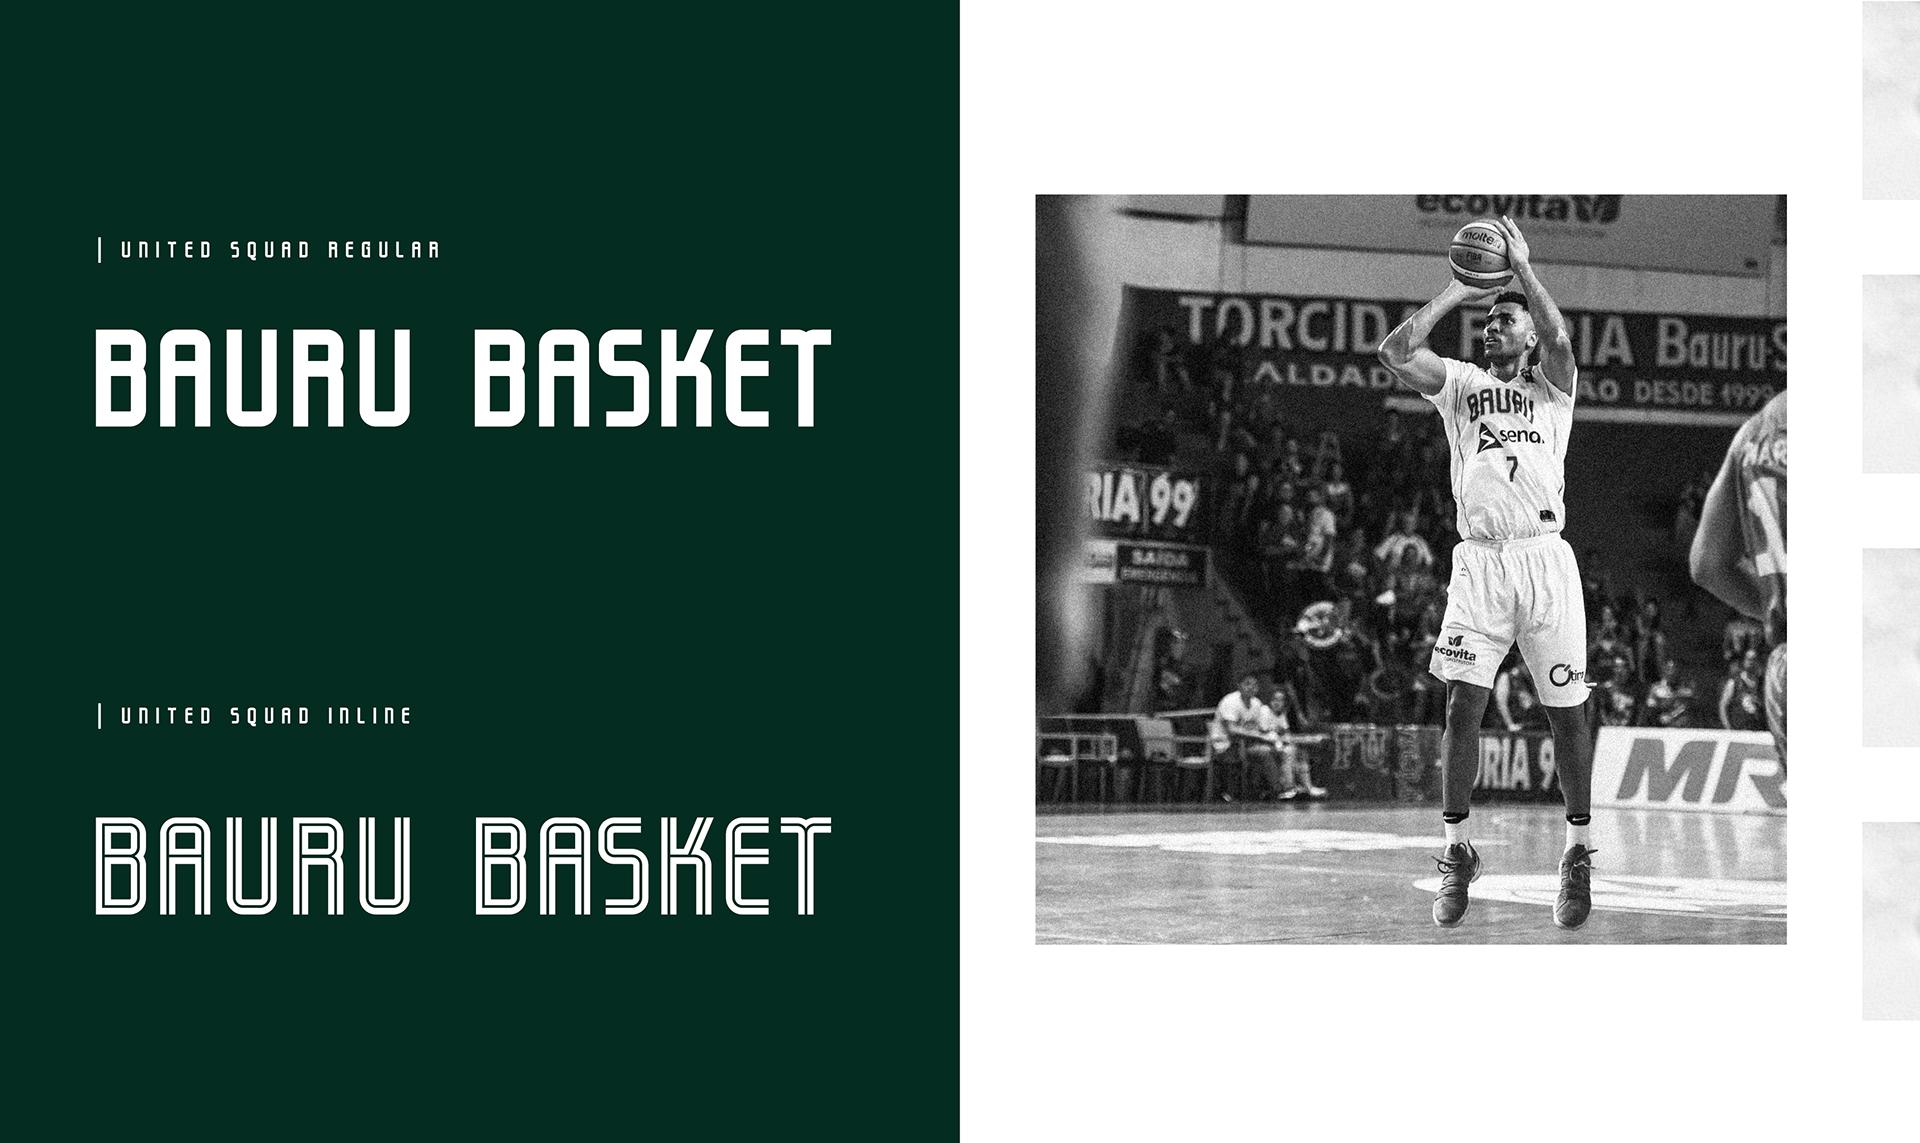 Bauru-Basket-Nacione-Branding-12